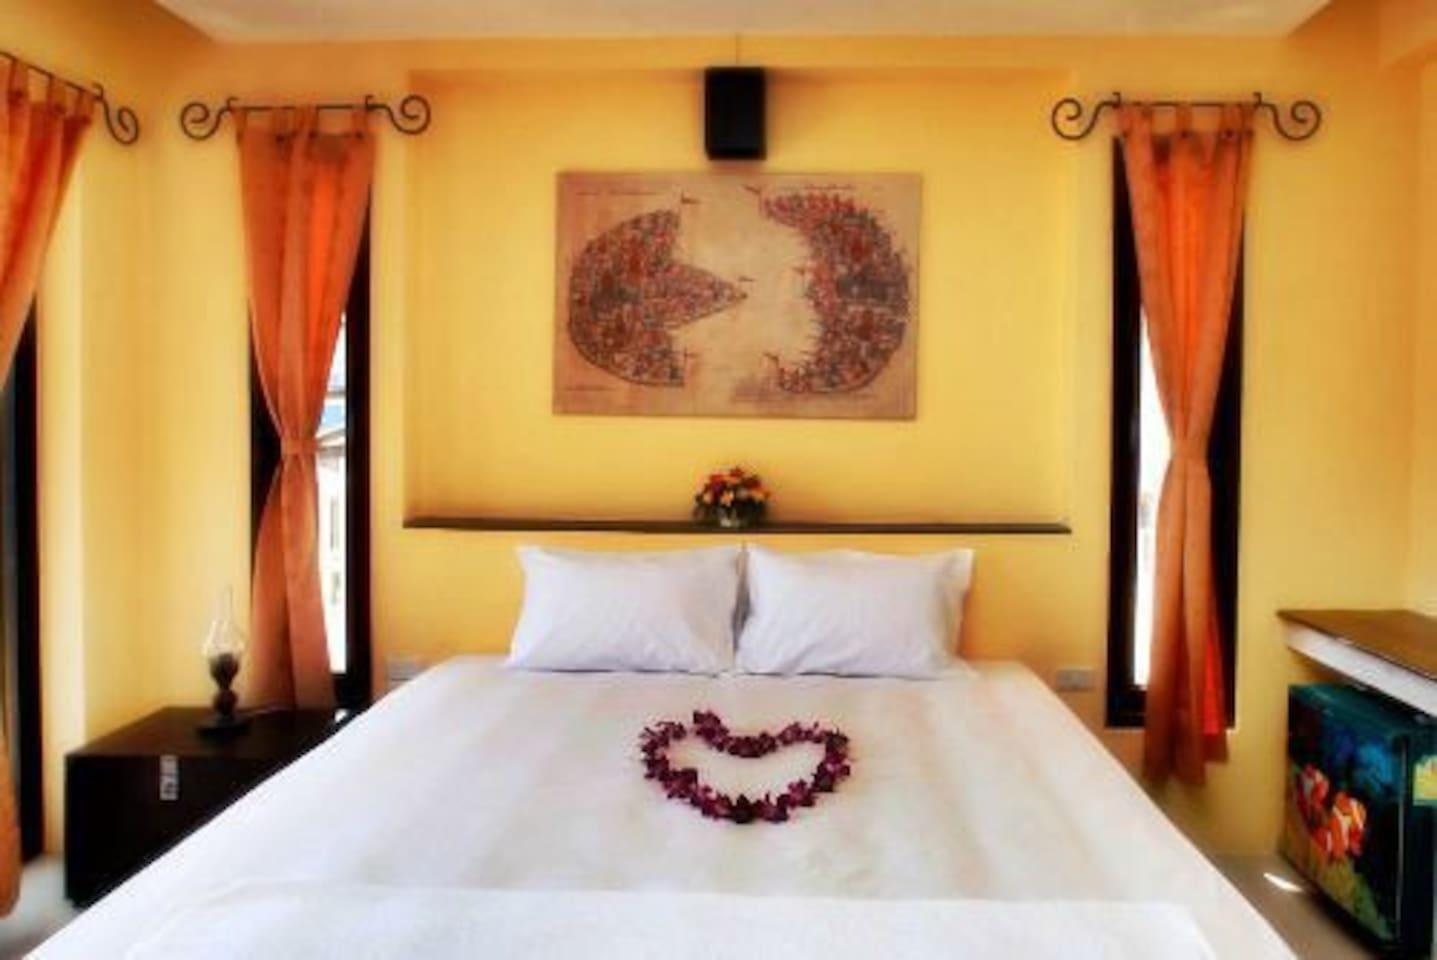 Double Room Deluxe with balcony 2 1 ห้องนอน 1 ห้องน้ำส่วนตัว ขนาด 30 ตร.ม. – หาดเฉวง